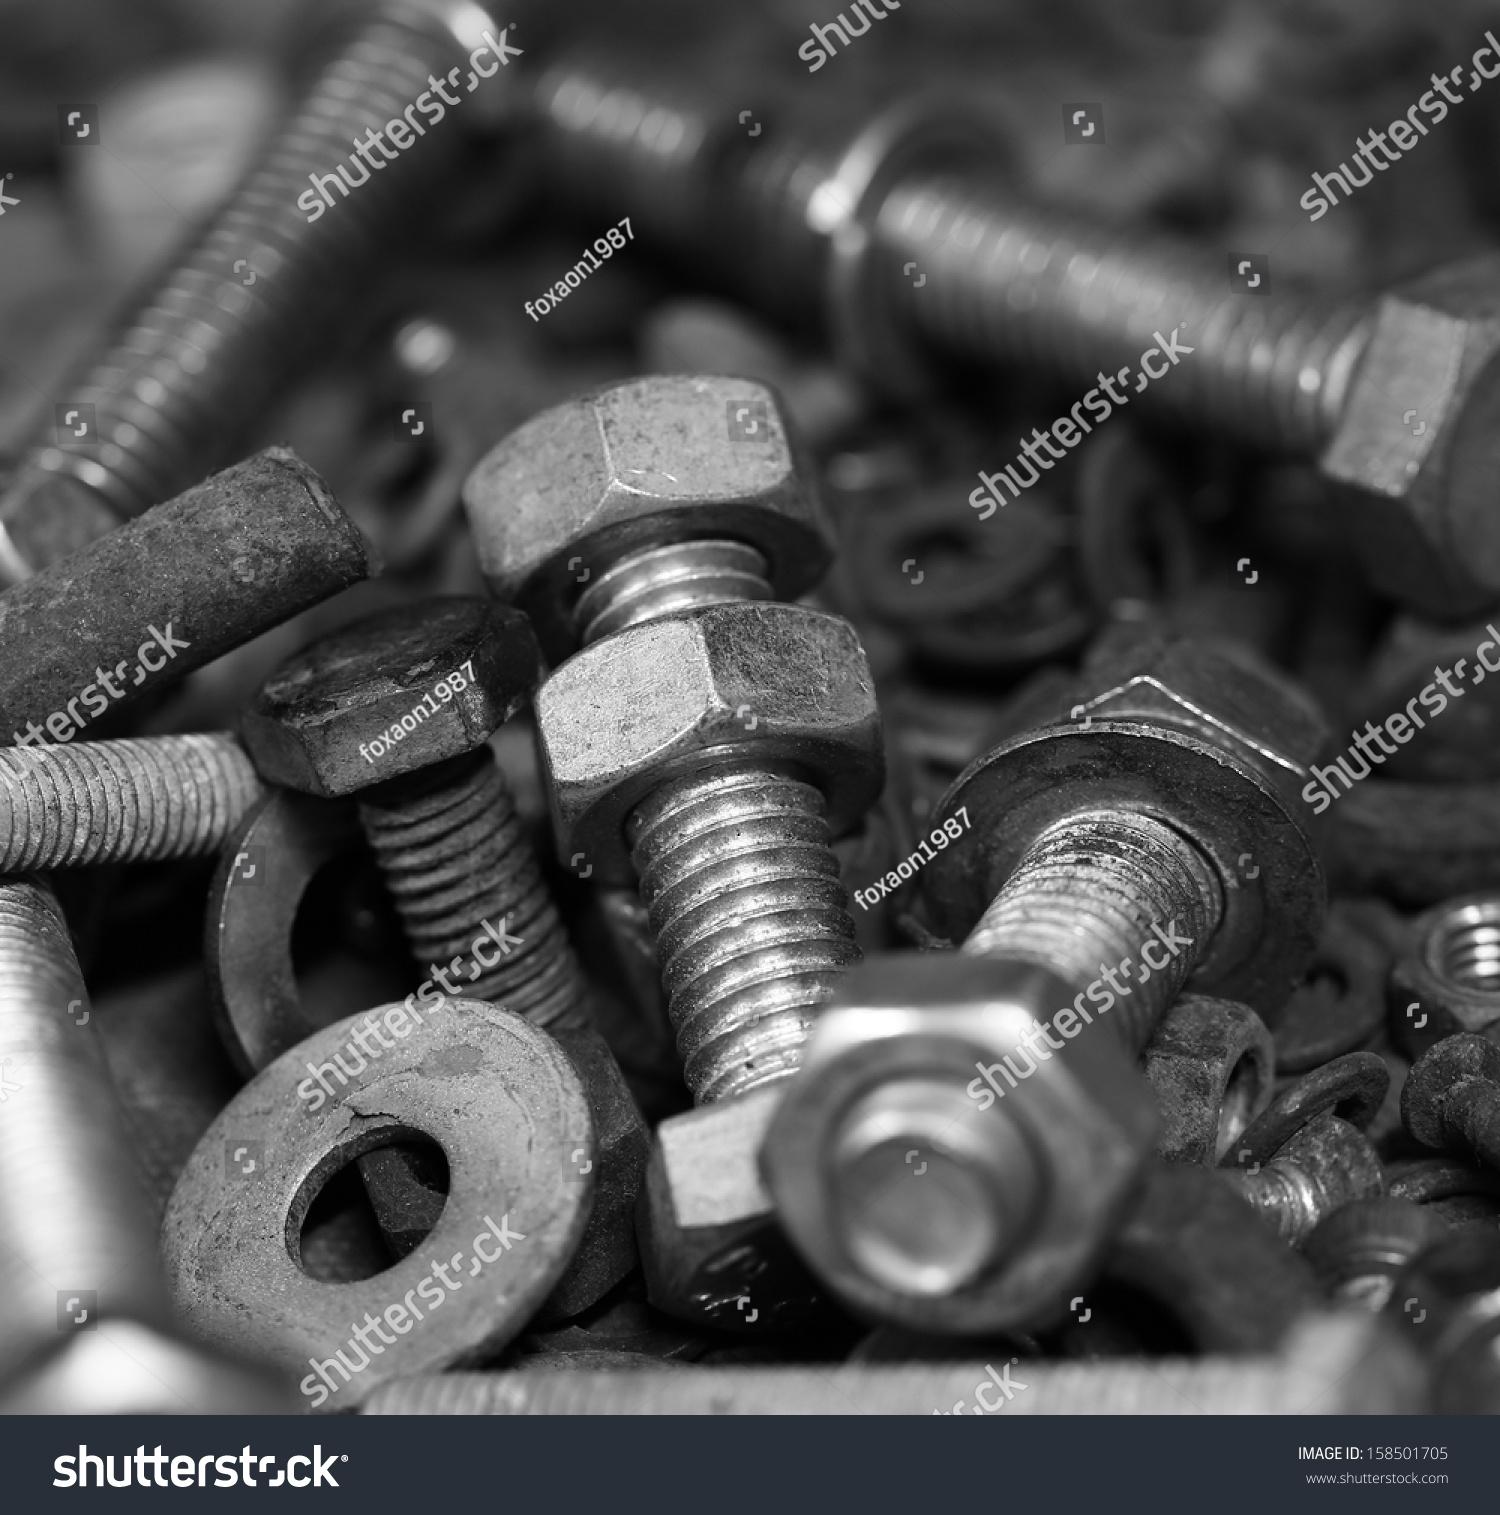 Metallic bolts photo